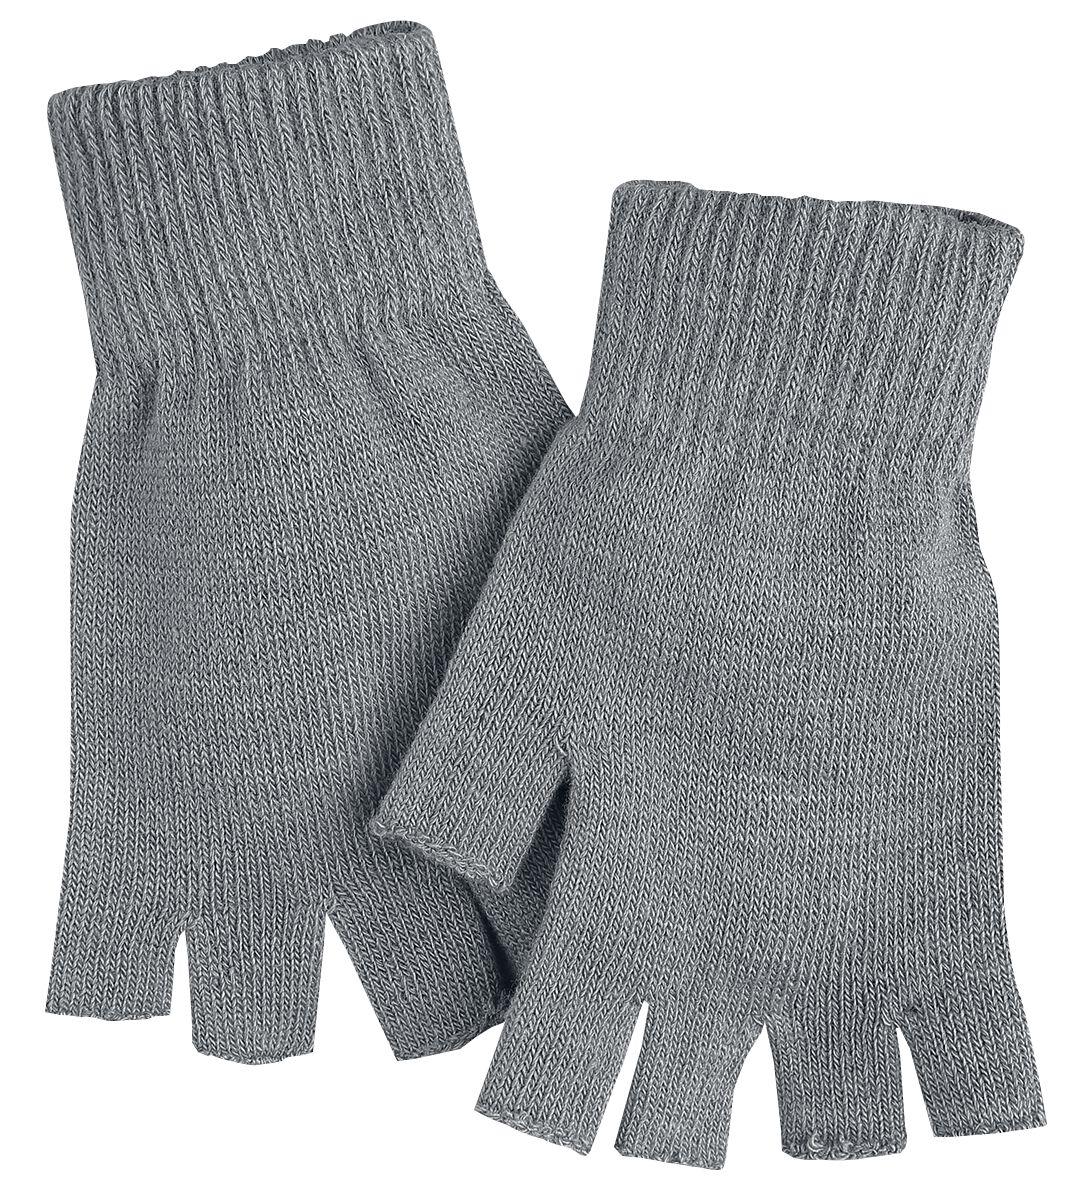 Handschuhe - Black Premium by EMP Hands Up Kurzfingerhandschuhe grau  - Onlineshop EMP